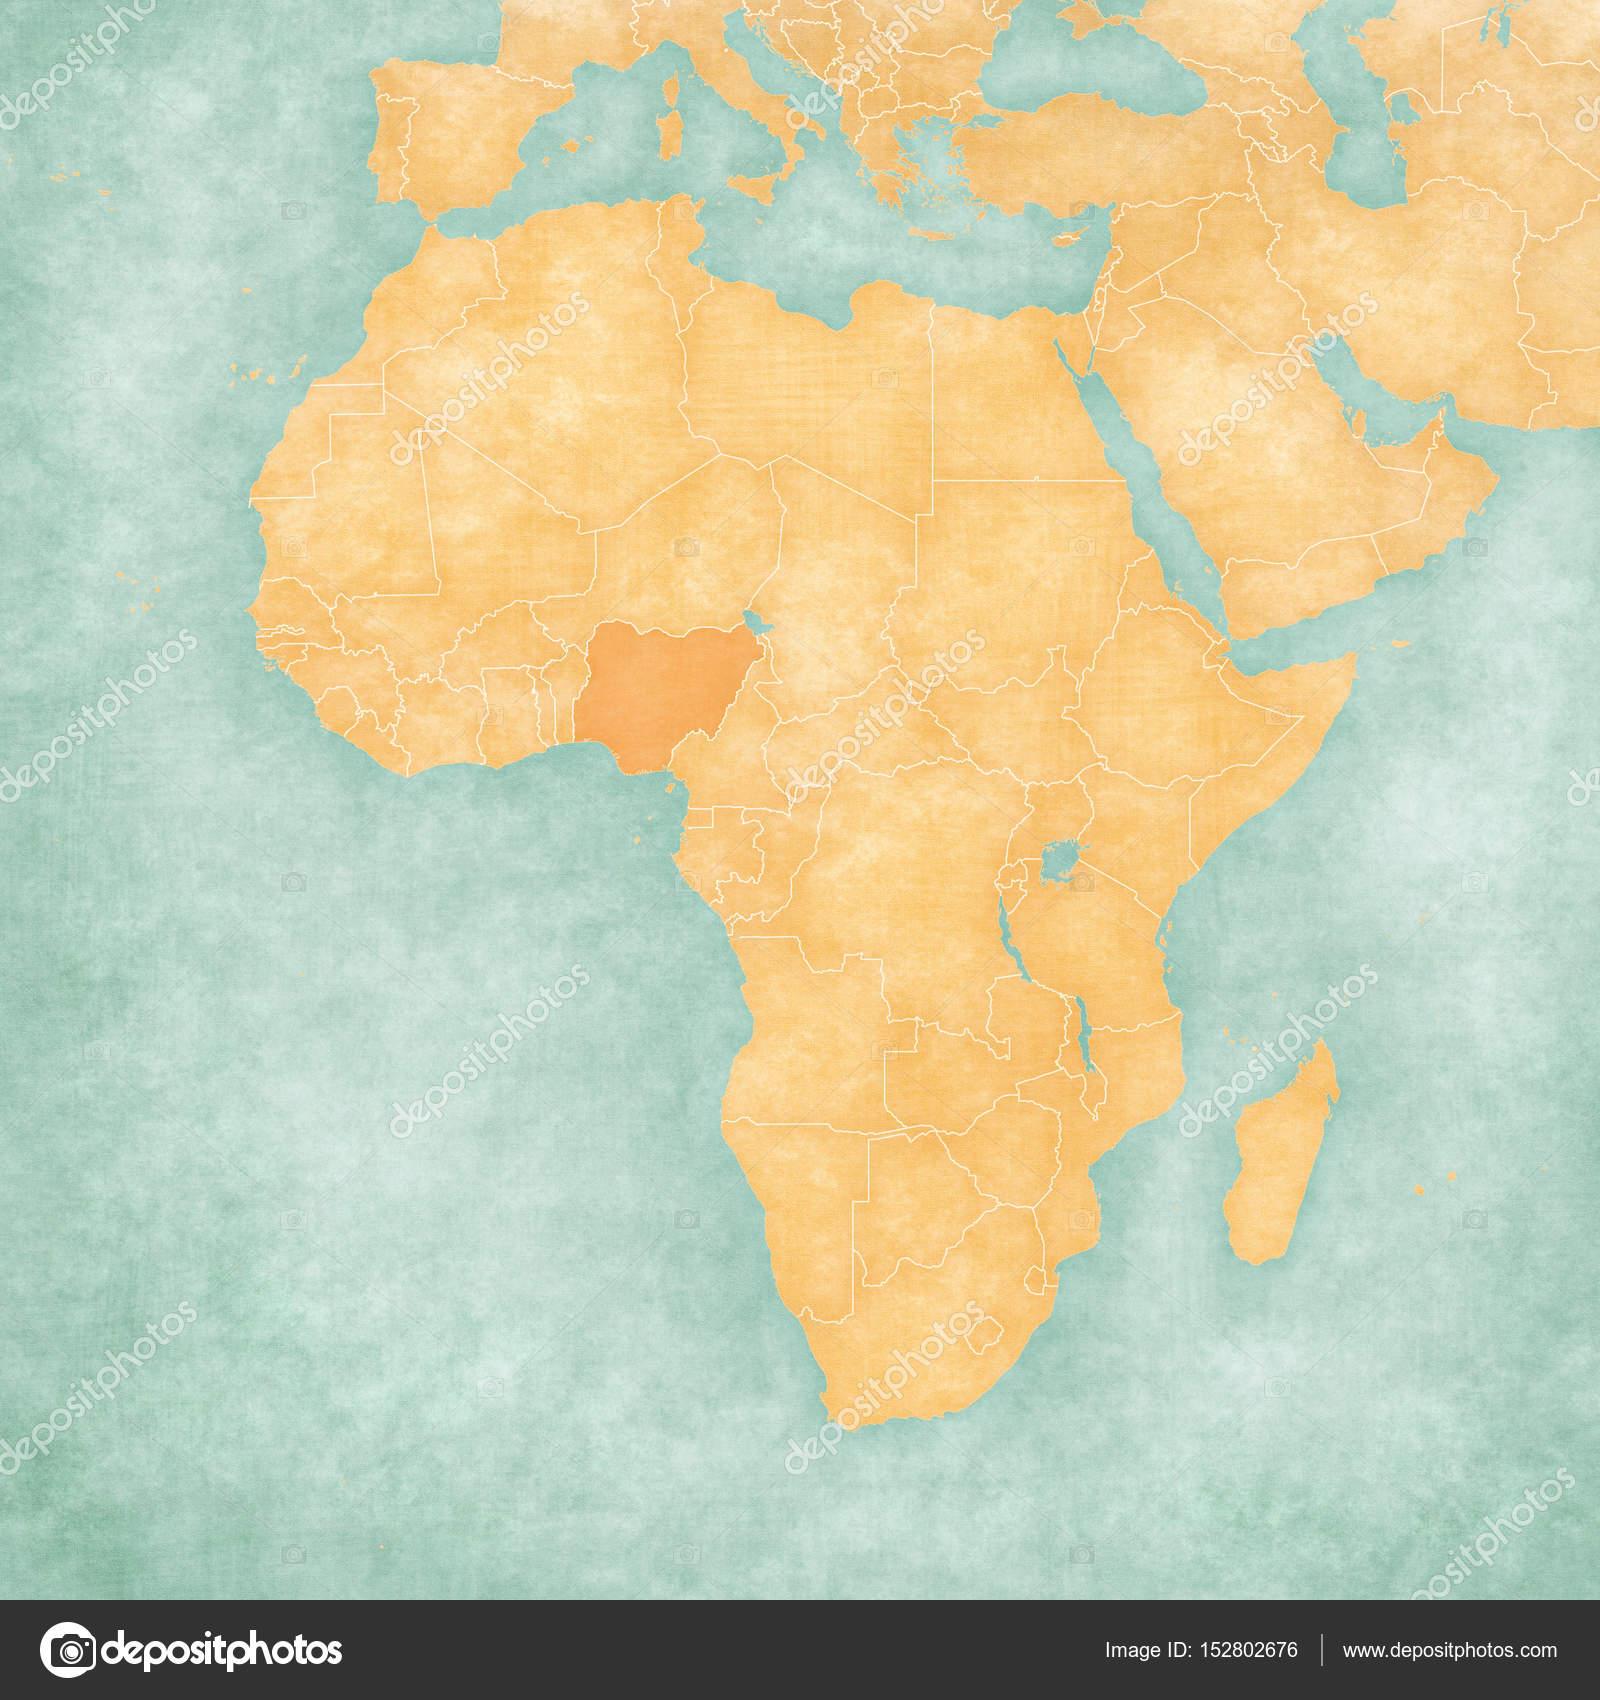 Map Of Africa Nigeria.Map Of Africa Nigeria Stock Photo C Tindo 152802676